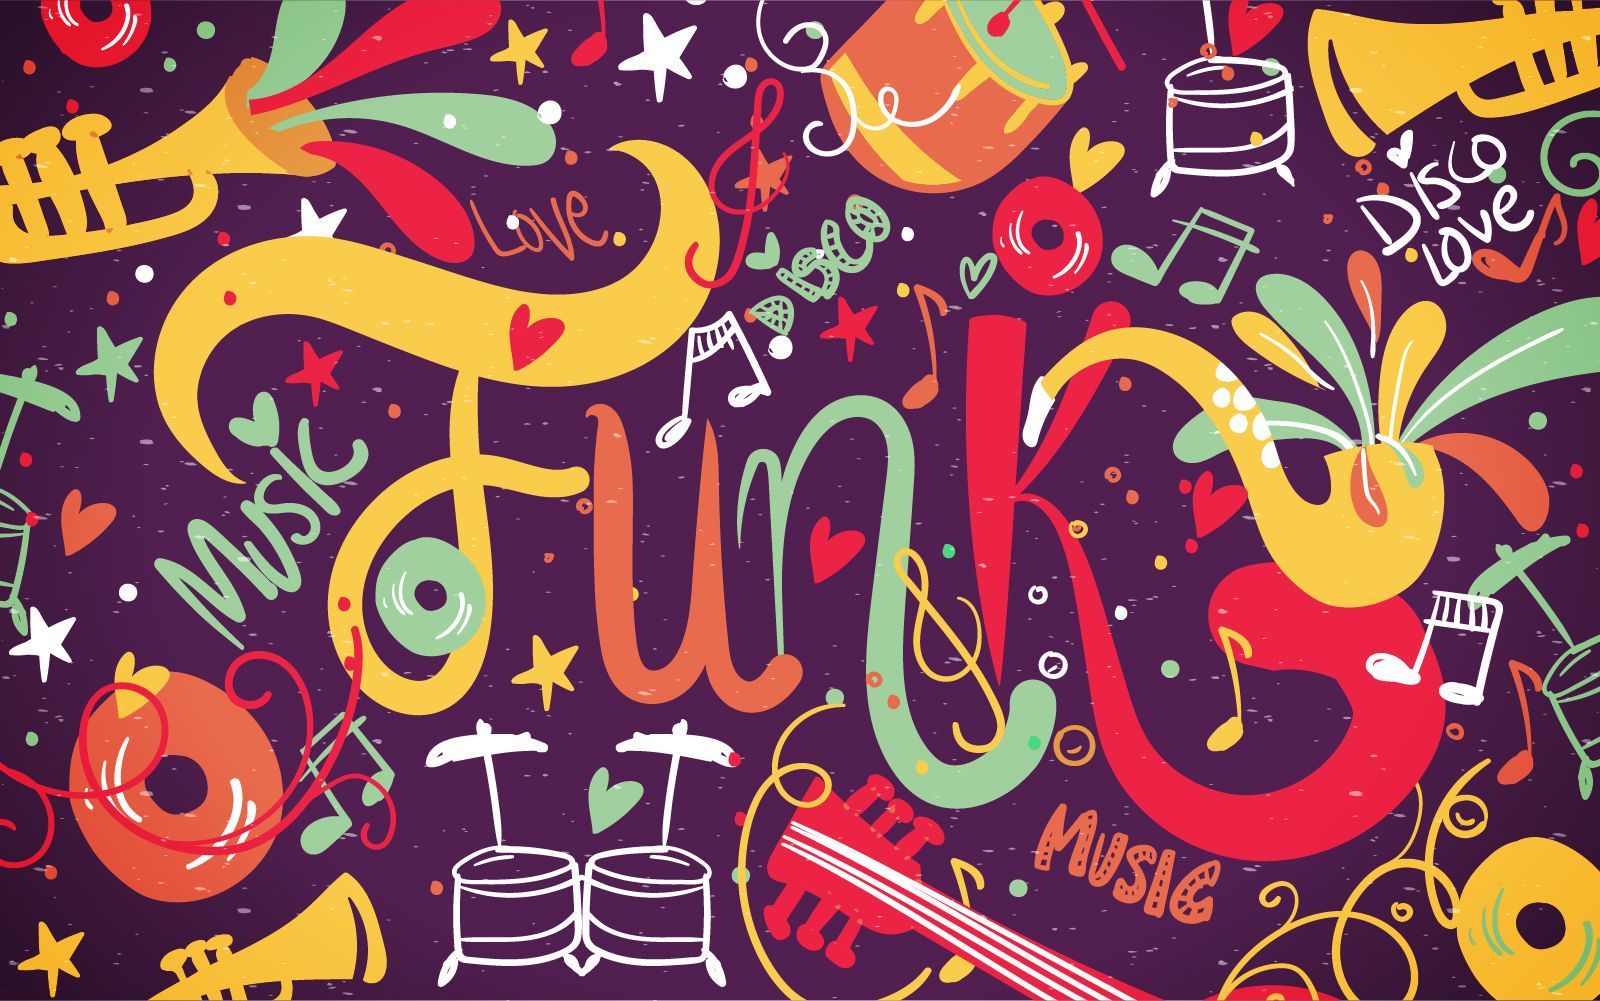 Fundo colorido de funk